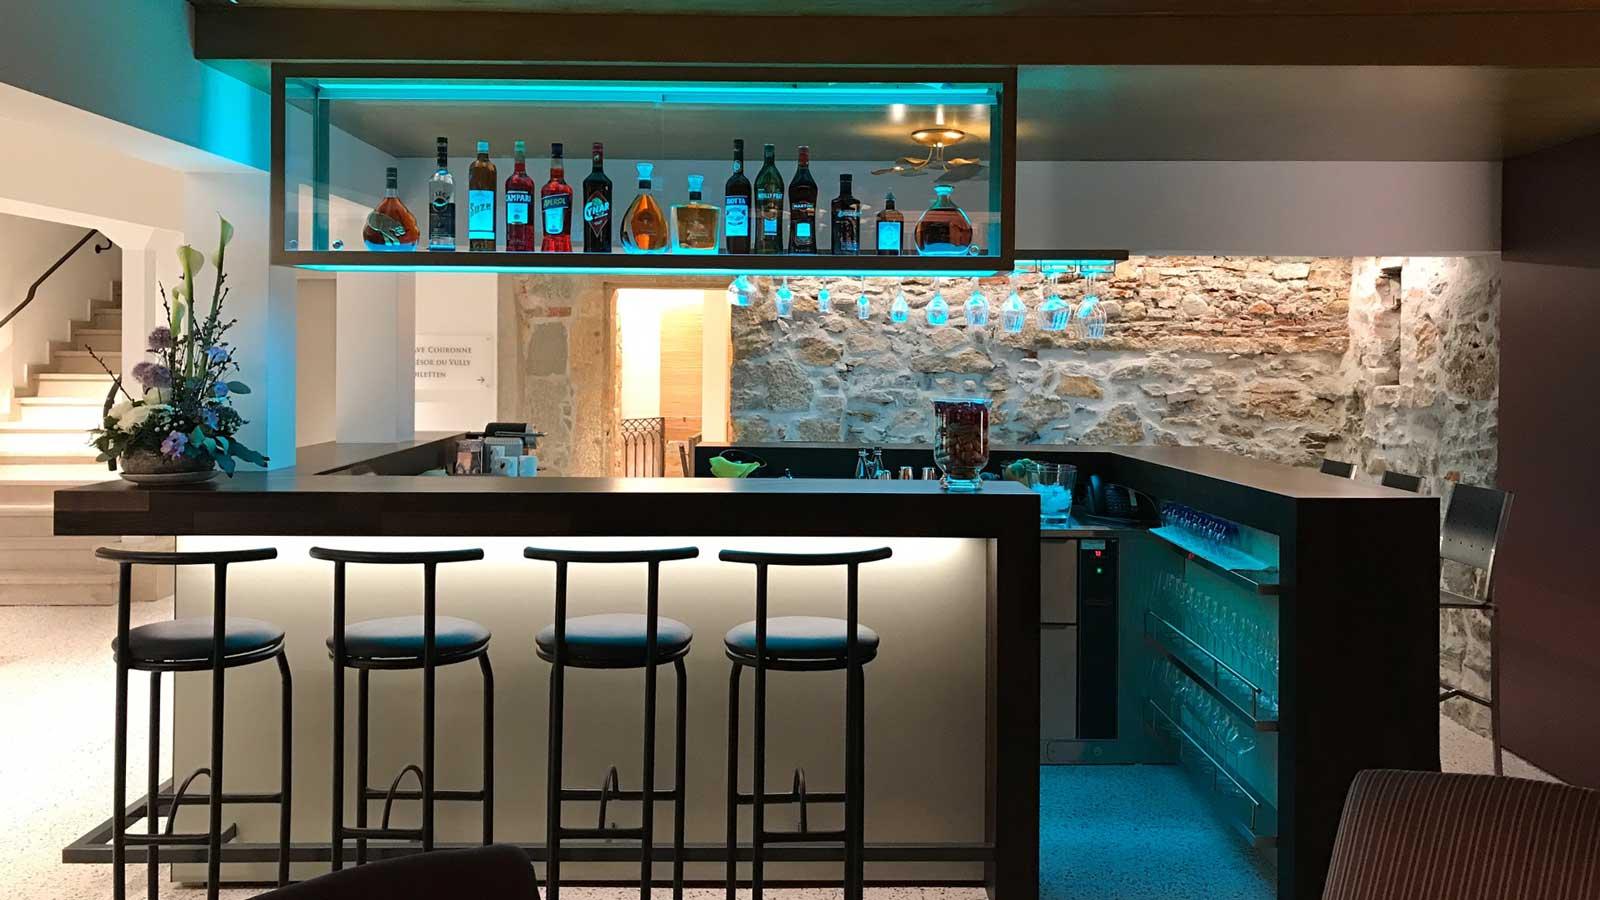 Krone Bar Hotel Murtenhof & Krone